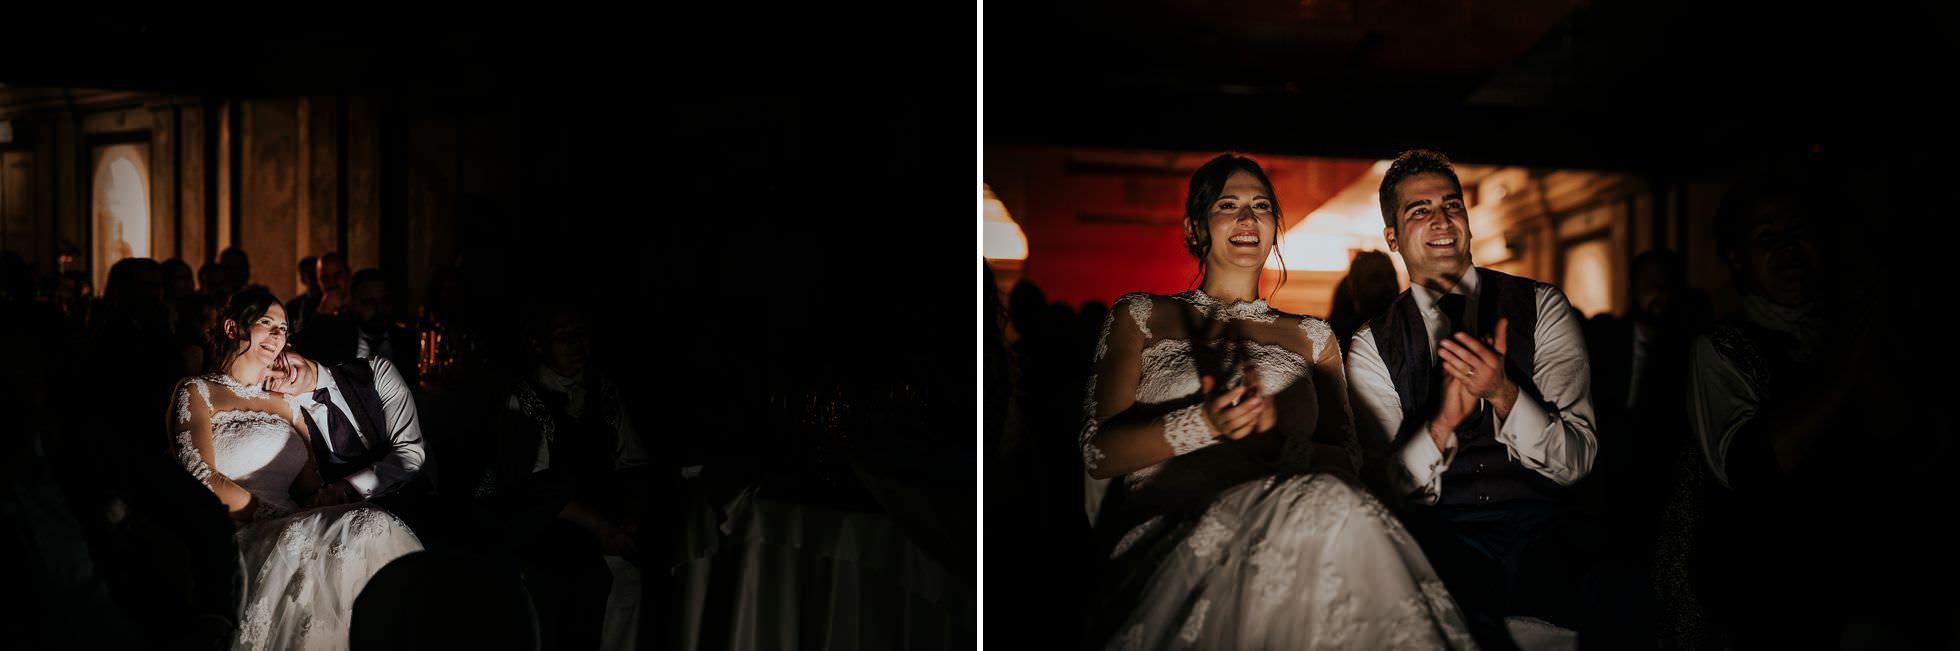 fotografo matrimonio picerno